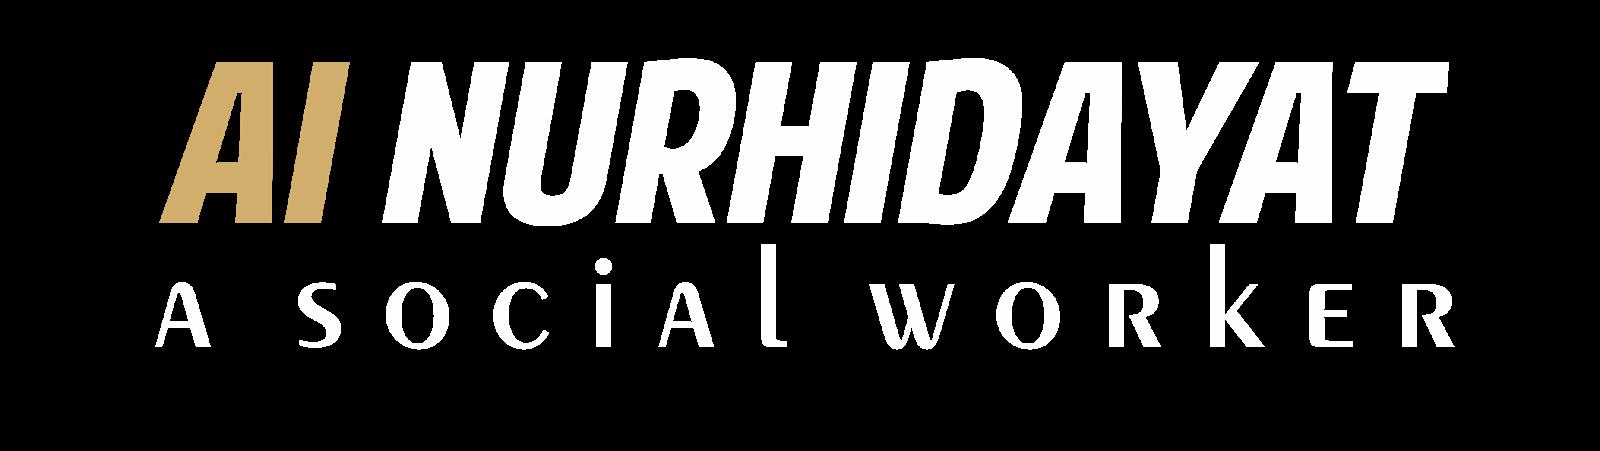 Ai Nurhidayat